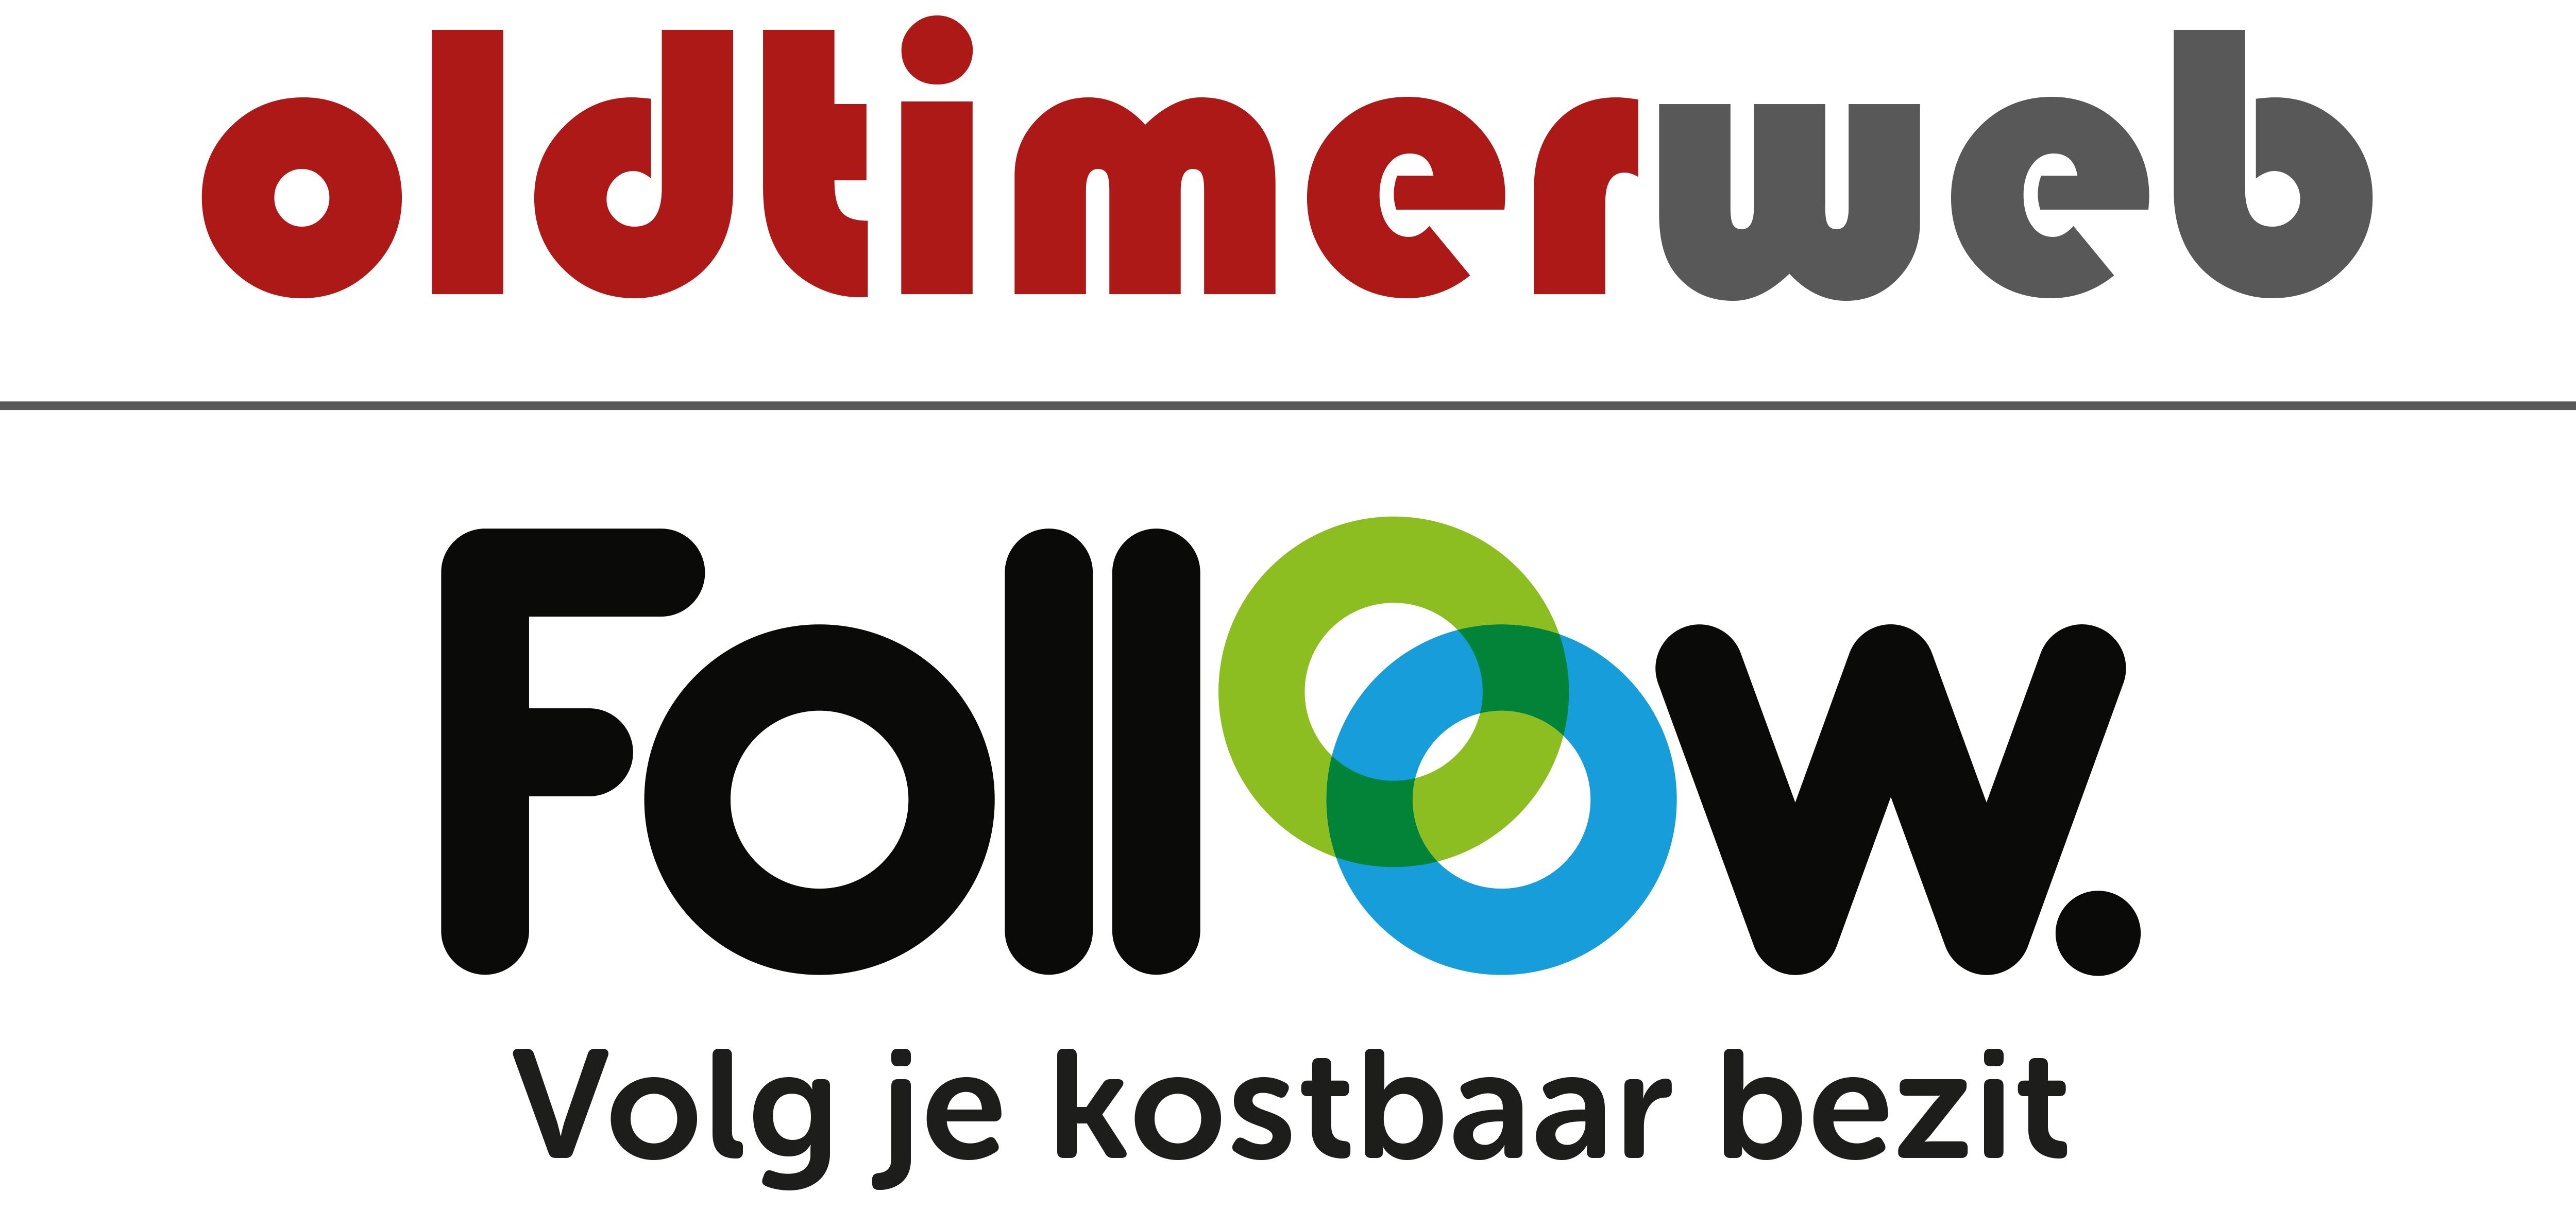 Folloow staat op Oldtimerweb.nl